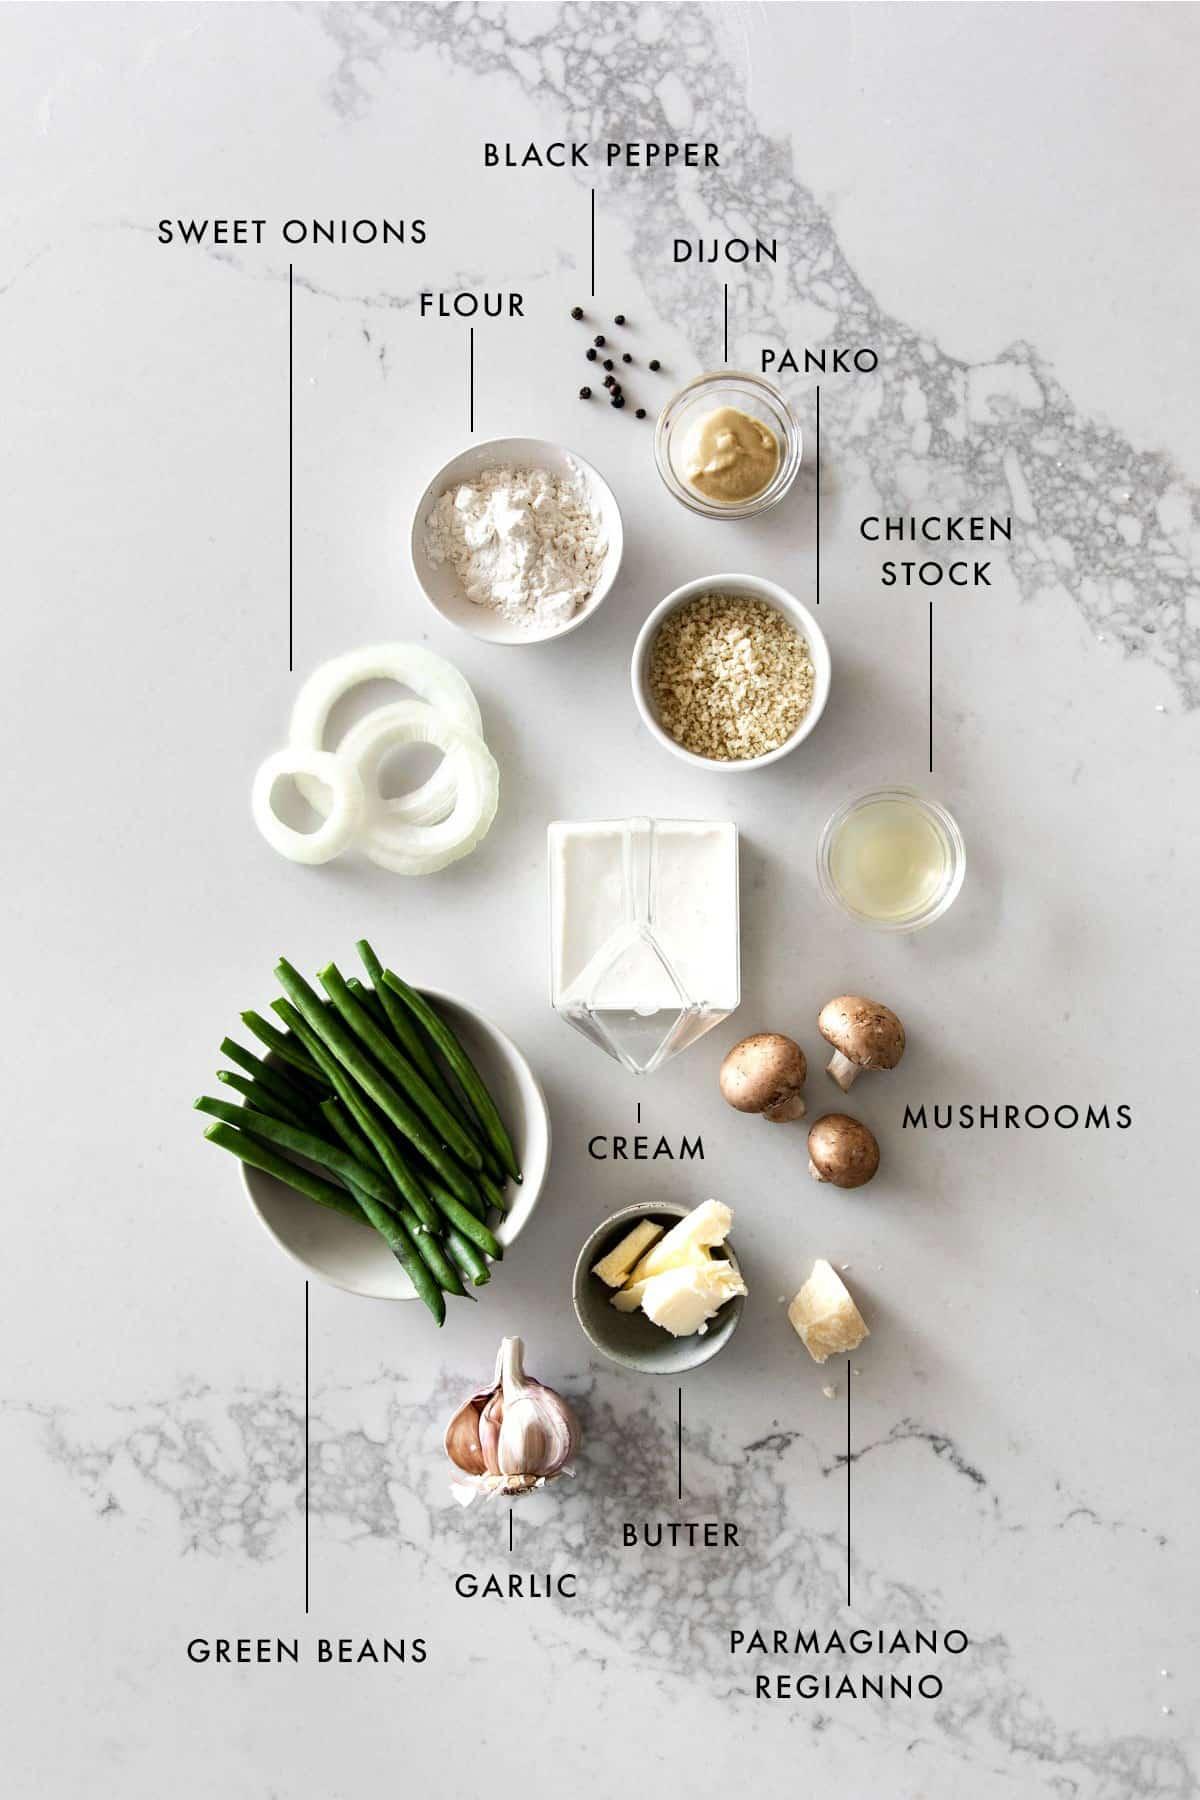 Ingredients to make homemade green bean casserole